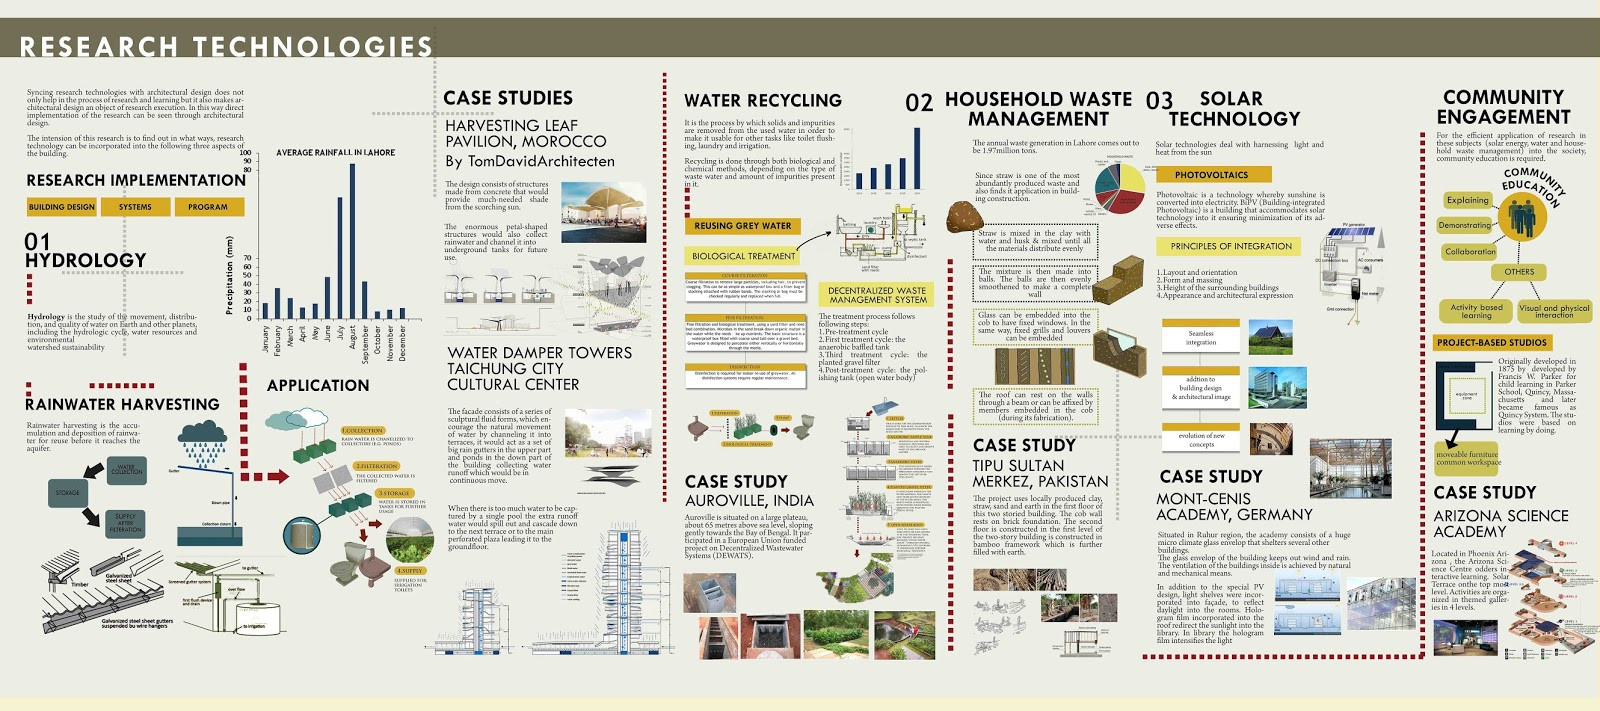 rain-water-harvesting, what-is-rain-water-harvesting, what-rain-water-harvesting, rain-water-harvesting-project, rain-water-harvesting-model, rain-water-harvesting-methods, rainwater-harvesting-system, rain-water-harvesting-drawing, advantages-of-rainwater-harvesting, rain-water-harvesting-pdf, rainwater-harvesting-diagram, rain-water-harvesting-pit, rain-water-harvesting-in-india, rain-water-harvesting-in-hindi, rain-water-harvesting-essay, rain-water-harvesting-ppt, rainwater-harvesting-filter, rain-water-harvesting-techniques, rain-water-harvesting-images, rain-water-harvesting-introduction, rain-water-harvesting-information, rain-water-harvesting-poster, about-rain-water-harvesting, rain-water-harvesting-bangalore, rain-water-harvesting-advantages, rain-water-harvesting-definition, importance-of-rain-water-harvesting, rain-water-harvesting-slogan, rain-water-harvesting-meaning-in-hindi, rain-water-harvesting-for-home, rain-water-harvesting-picture, project-on-rain-water-harvesting, essay-on-rain-water-harvesting, rain-water-harvesting-wikipedia, slogan-on-rain-water-harvesting, rain-water-harvesting-filter, rain-water-harvesting-filtration, rainwater-harvesting-tank, how-to-do-rainwater-harvesting, methods-of-rain-water-harvesting, rain-water-harvesting-cost, rain-water-harvesting-working-model, rain-water-harvesting-project-pdf, how-rain-water-harvesting-is-done, uses-of-rain-water-harvesting, rain-water-harvesting-methods-pdf, how-is-rain-water-harvesting-done, rain-water-harvesting-meaning, ppt-on-rain-water-harvesting, rain-water-harvesting-slideshare, rain-water-harvesting-at-home, rain-water-harvesting-speech, rain-water-harvesting-quotation, rain-water-harvesting-explanation, rain-water-harvesting-conclusion, rain-water-harvesting-chart, rain-water-harvesting-process, rain-water-harvesting-photos, rain-water-harvesting-methods-in-india, rain-water-harvesting-uses, rain-water-harvesting-quotes, rain-water-harvesting-history, rain-water-harvesting-objective